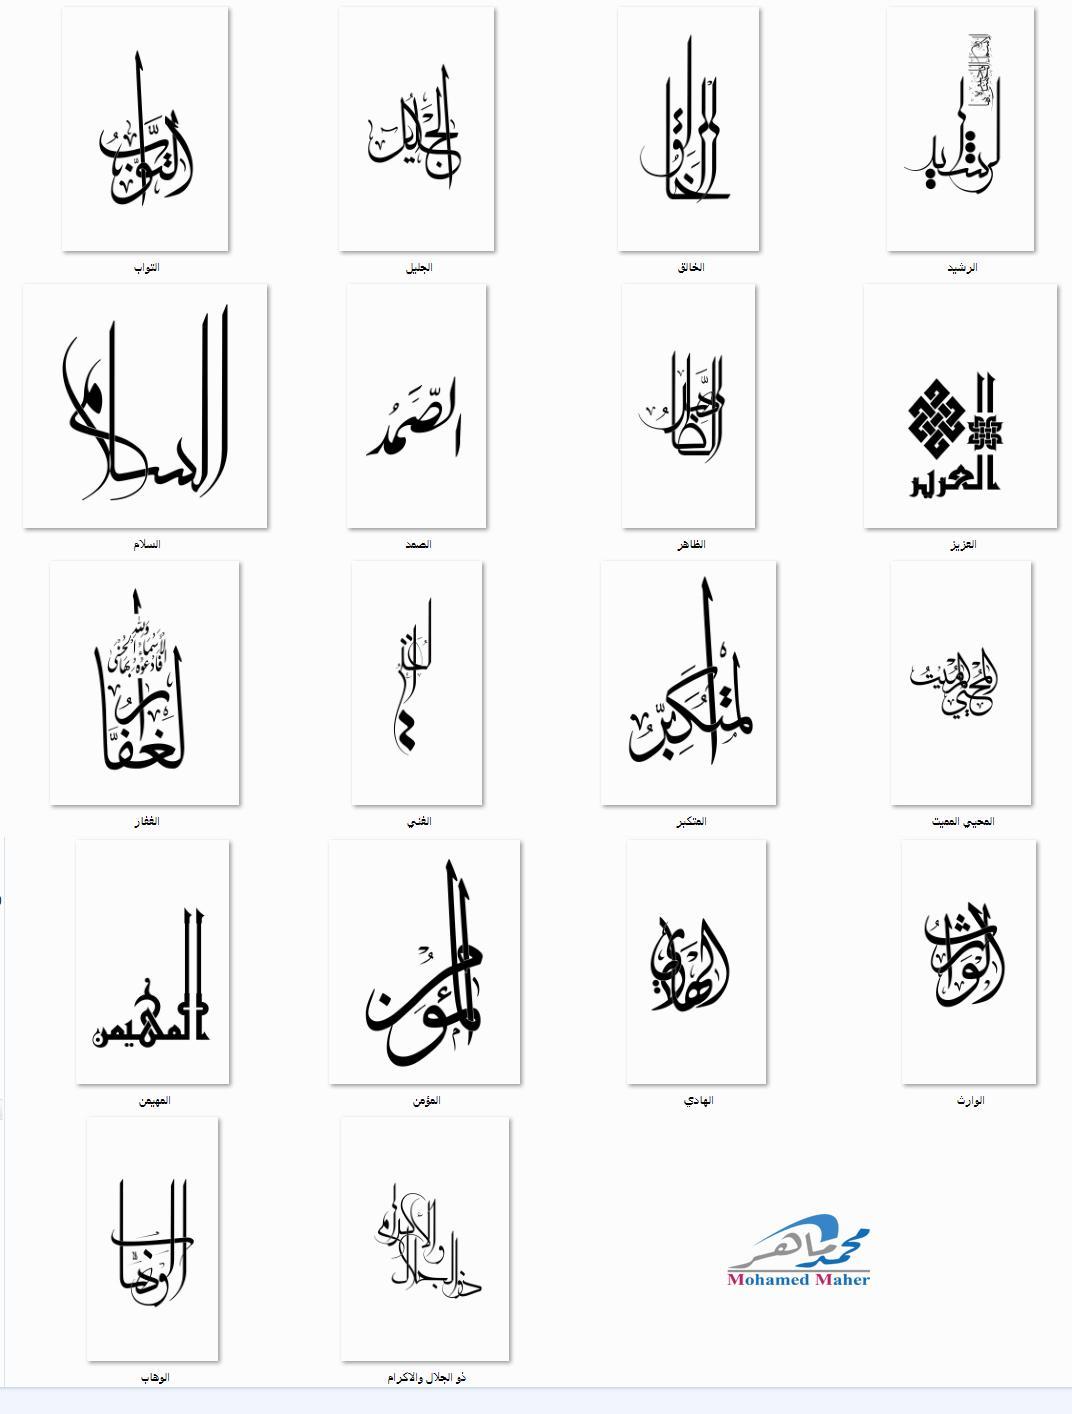 مخطوطه اسلاميه مفرغه بصيغة